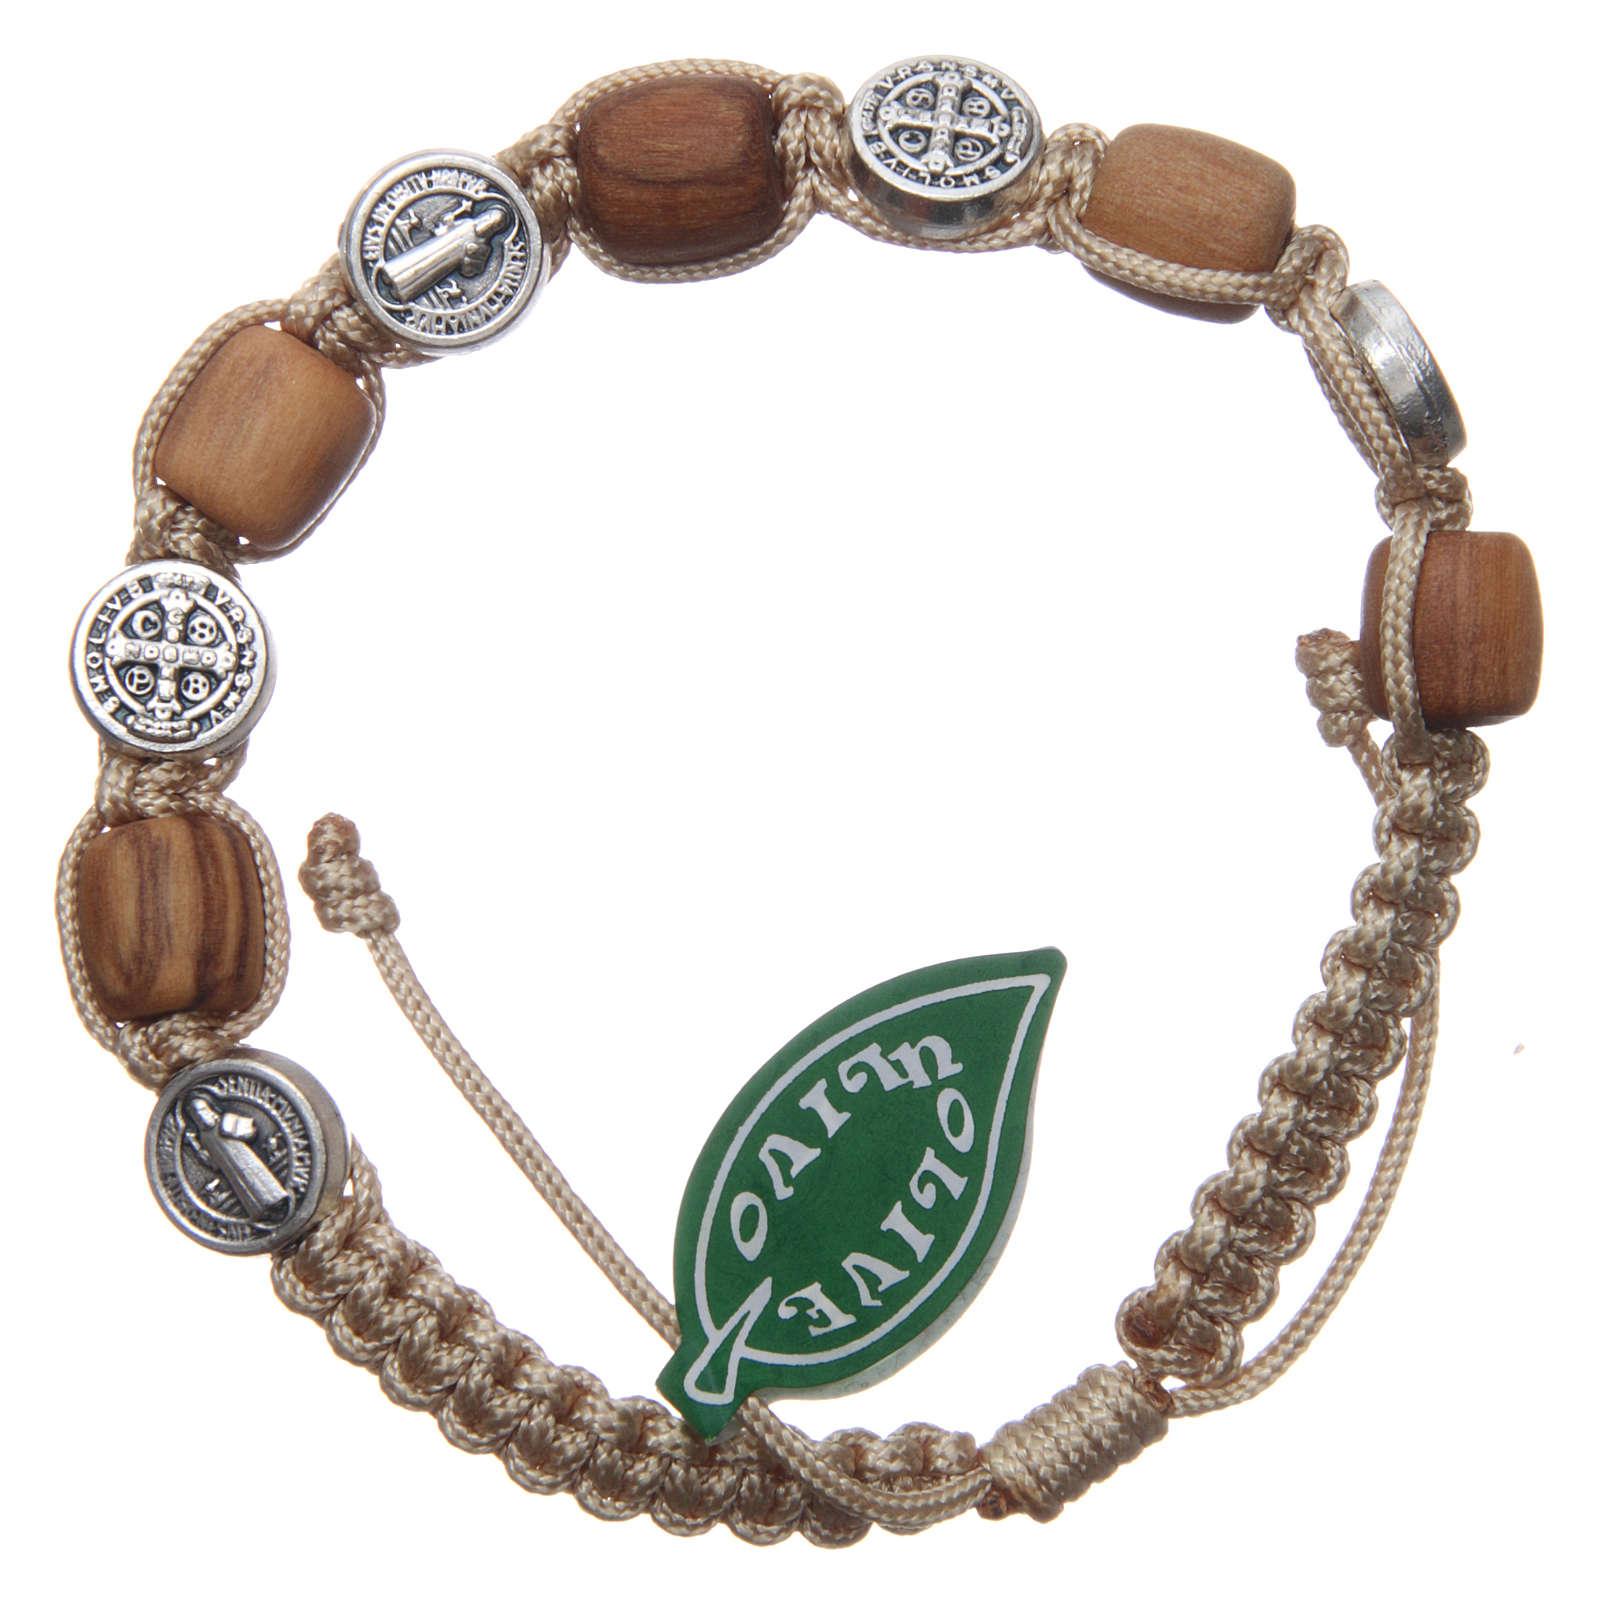 Bracelet bois olivier croix St Benoît corde beige 4